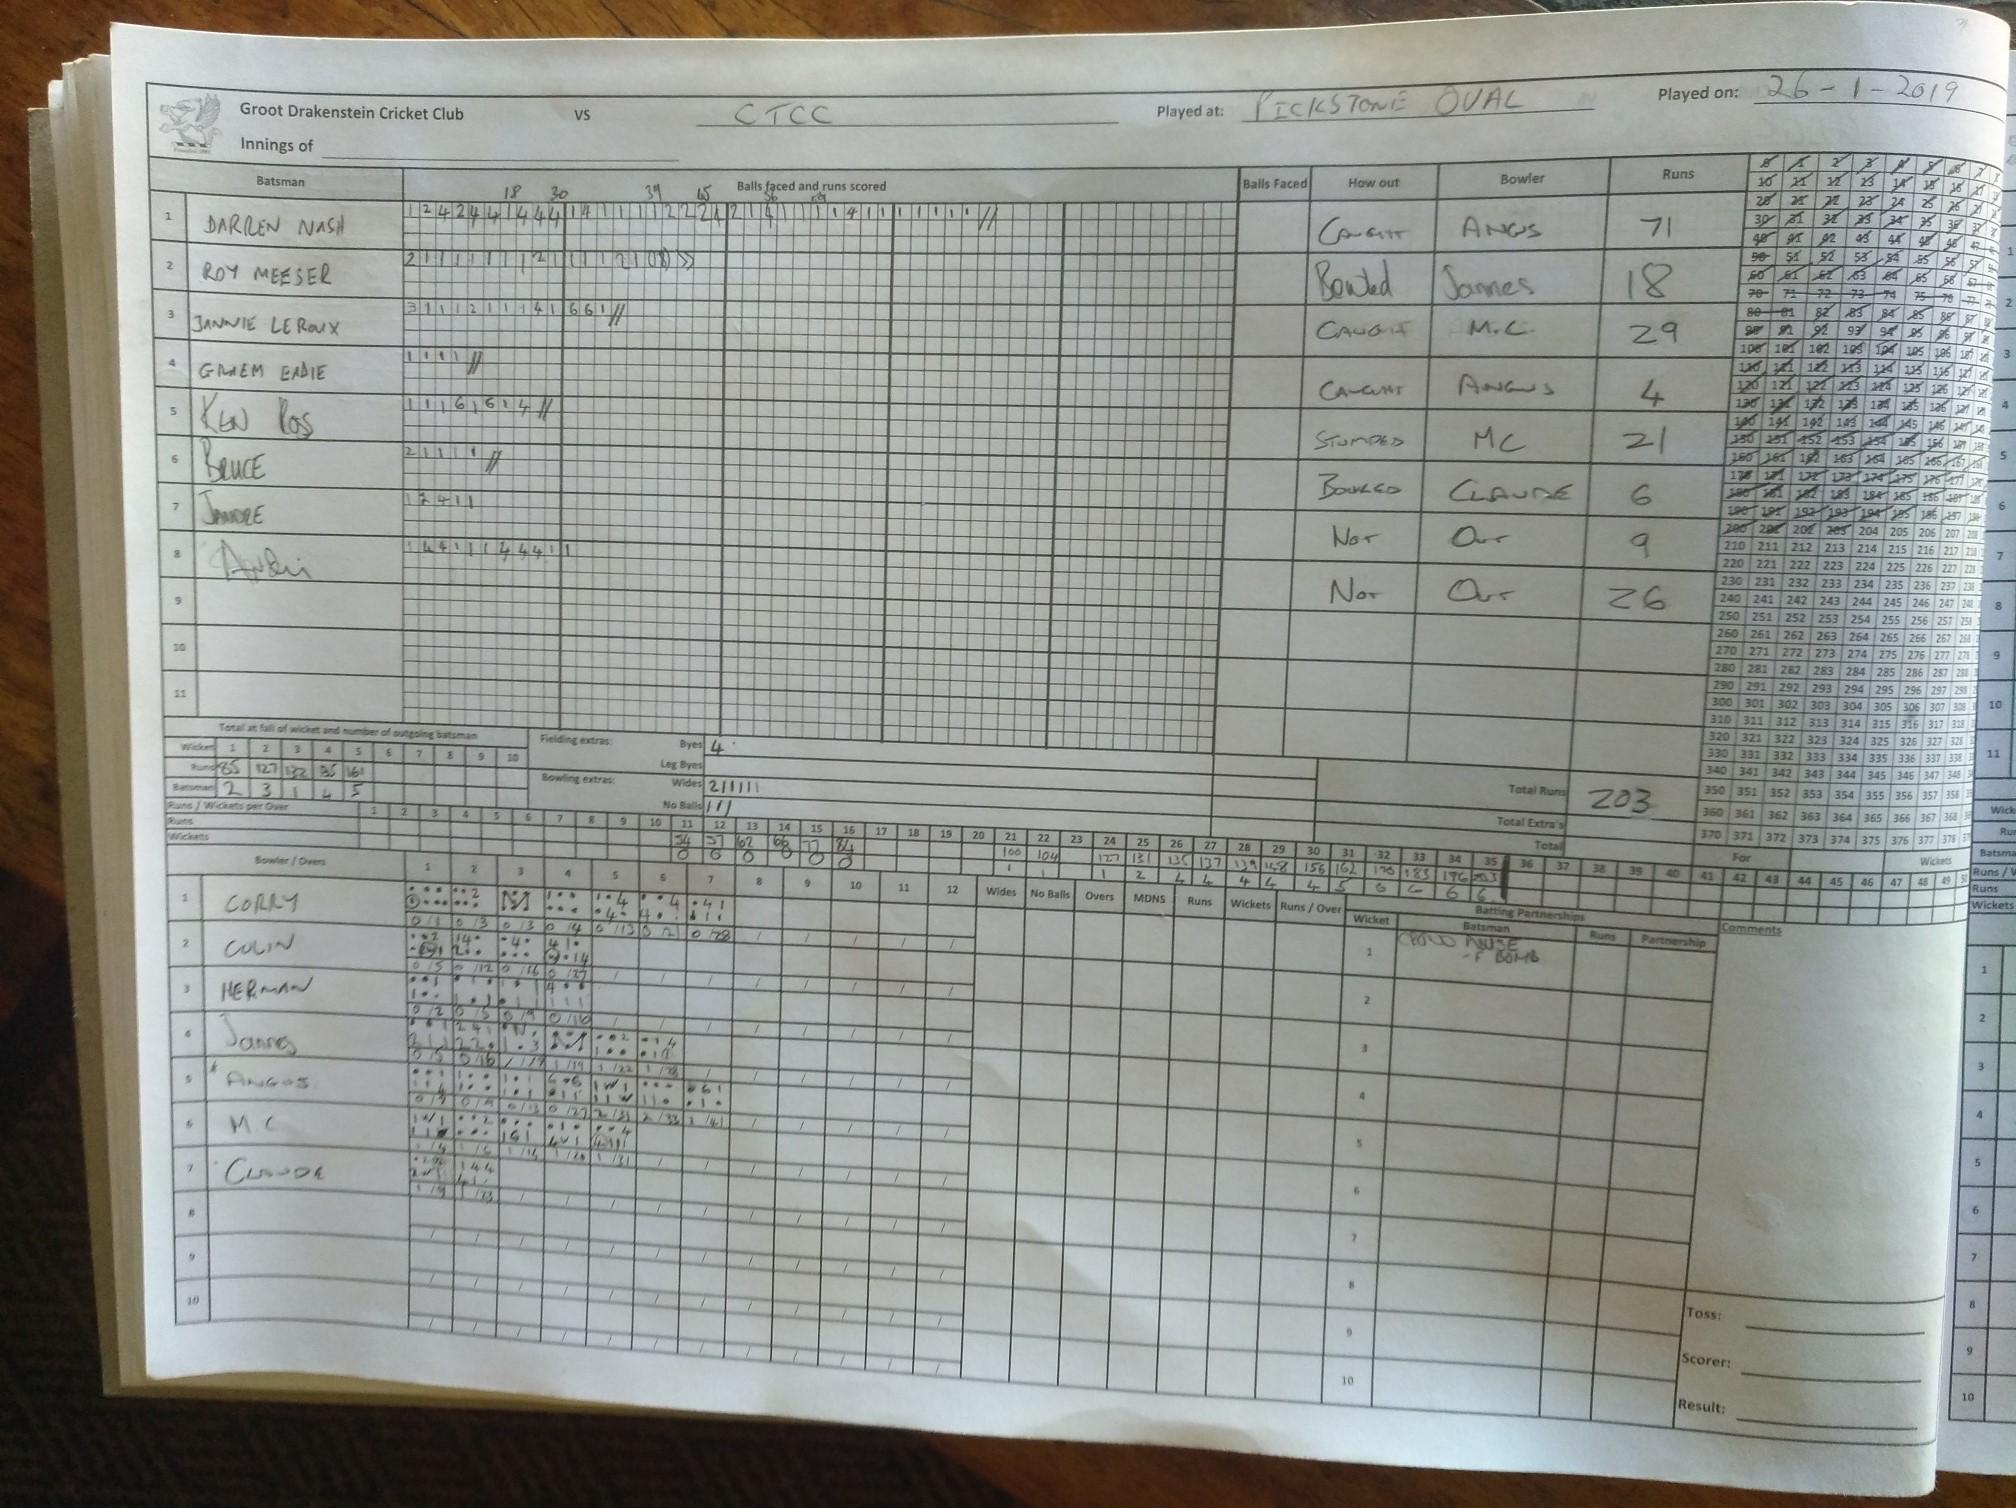 CTCC's Batting Card